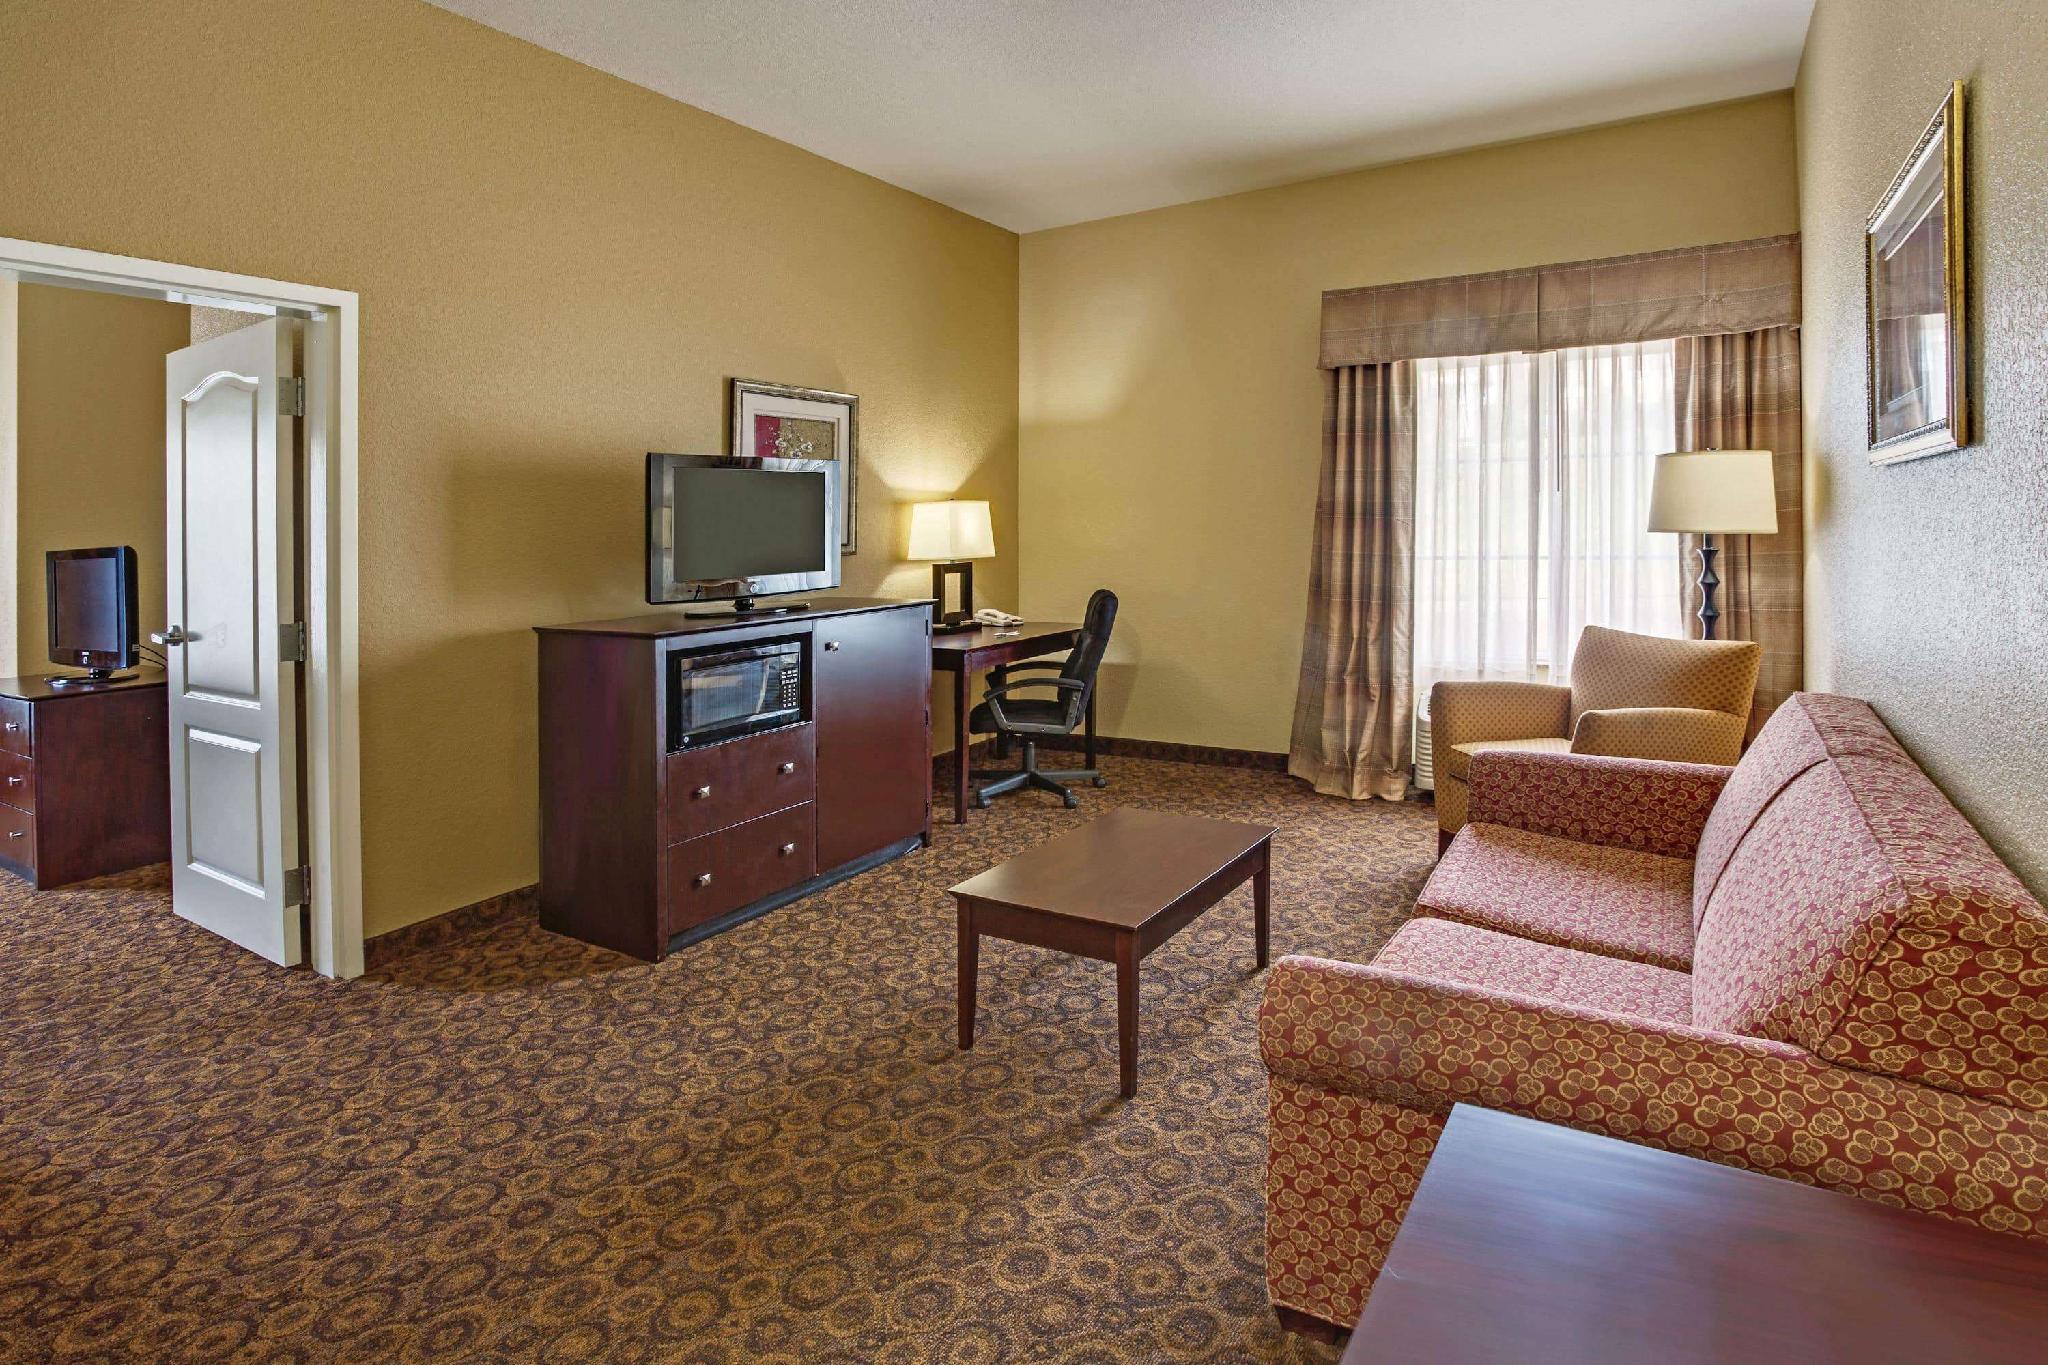 La Quinta Inn & Suites By Wyndham Vicksburg